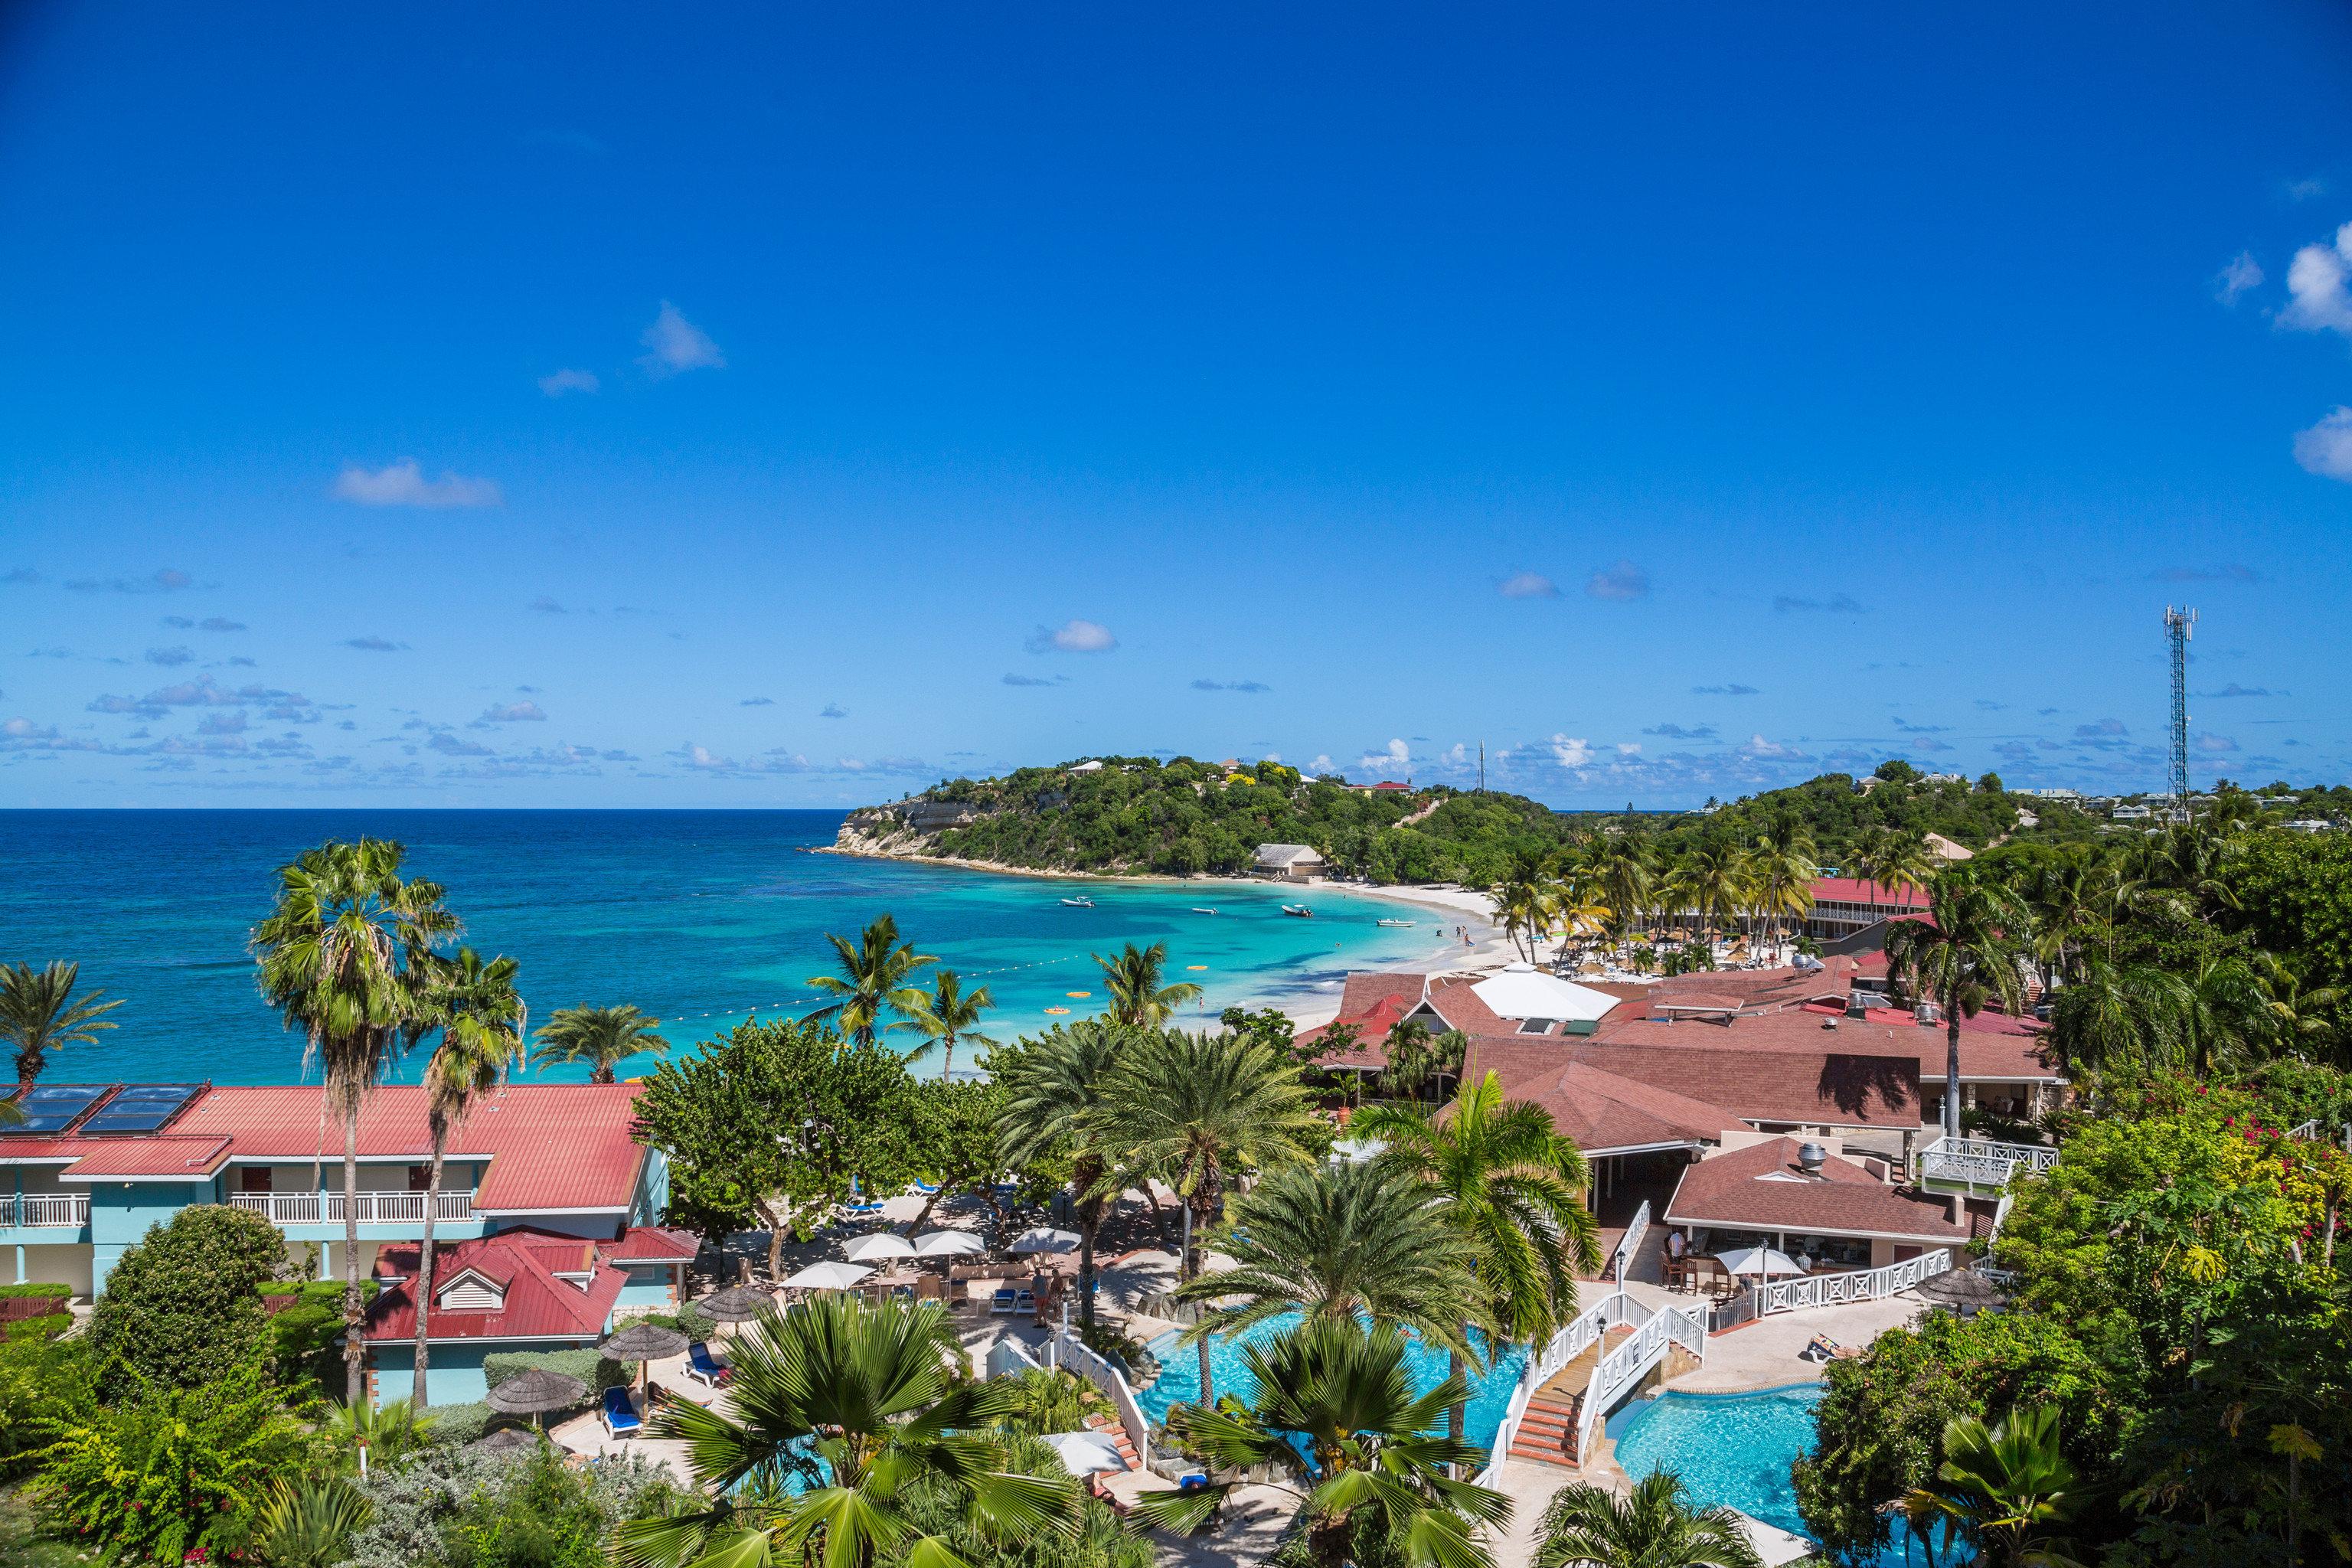 sky tree Beach Sea caribbean Resort Ocean Coast tropics lawn Island Lagoon overlooking beautiful